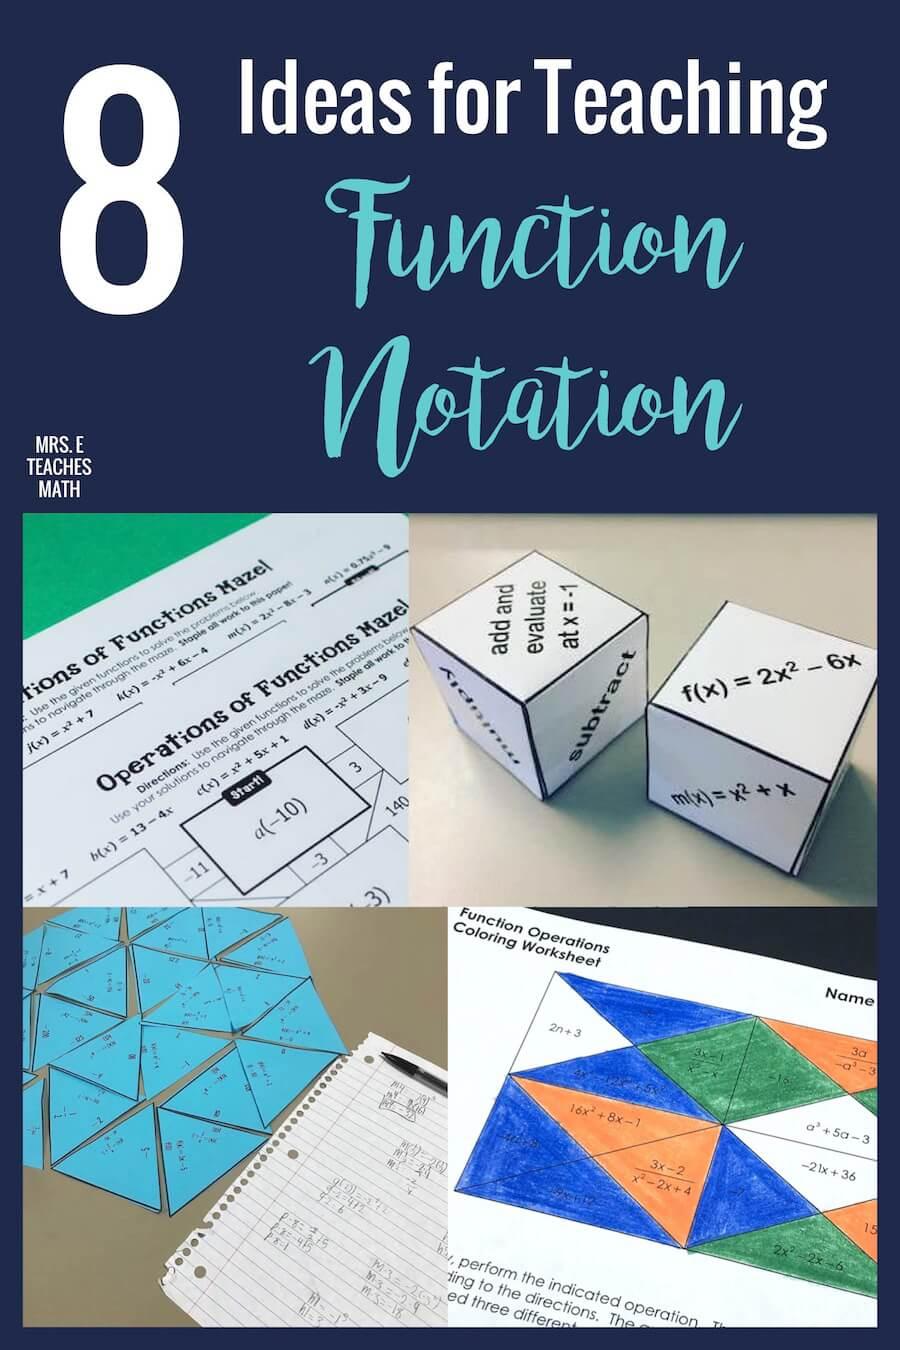 8 Ideas for Teaching Function Notation   Mrs. E Teaches Math [ 1350 x 900 Pixel ]